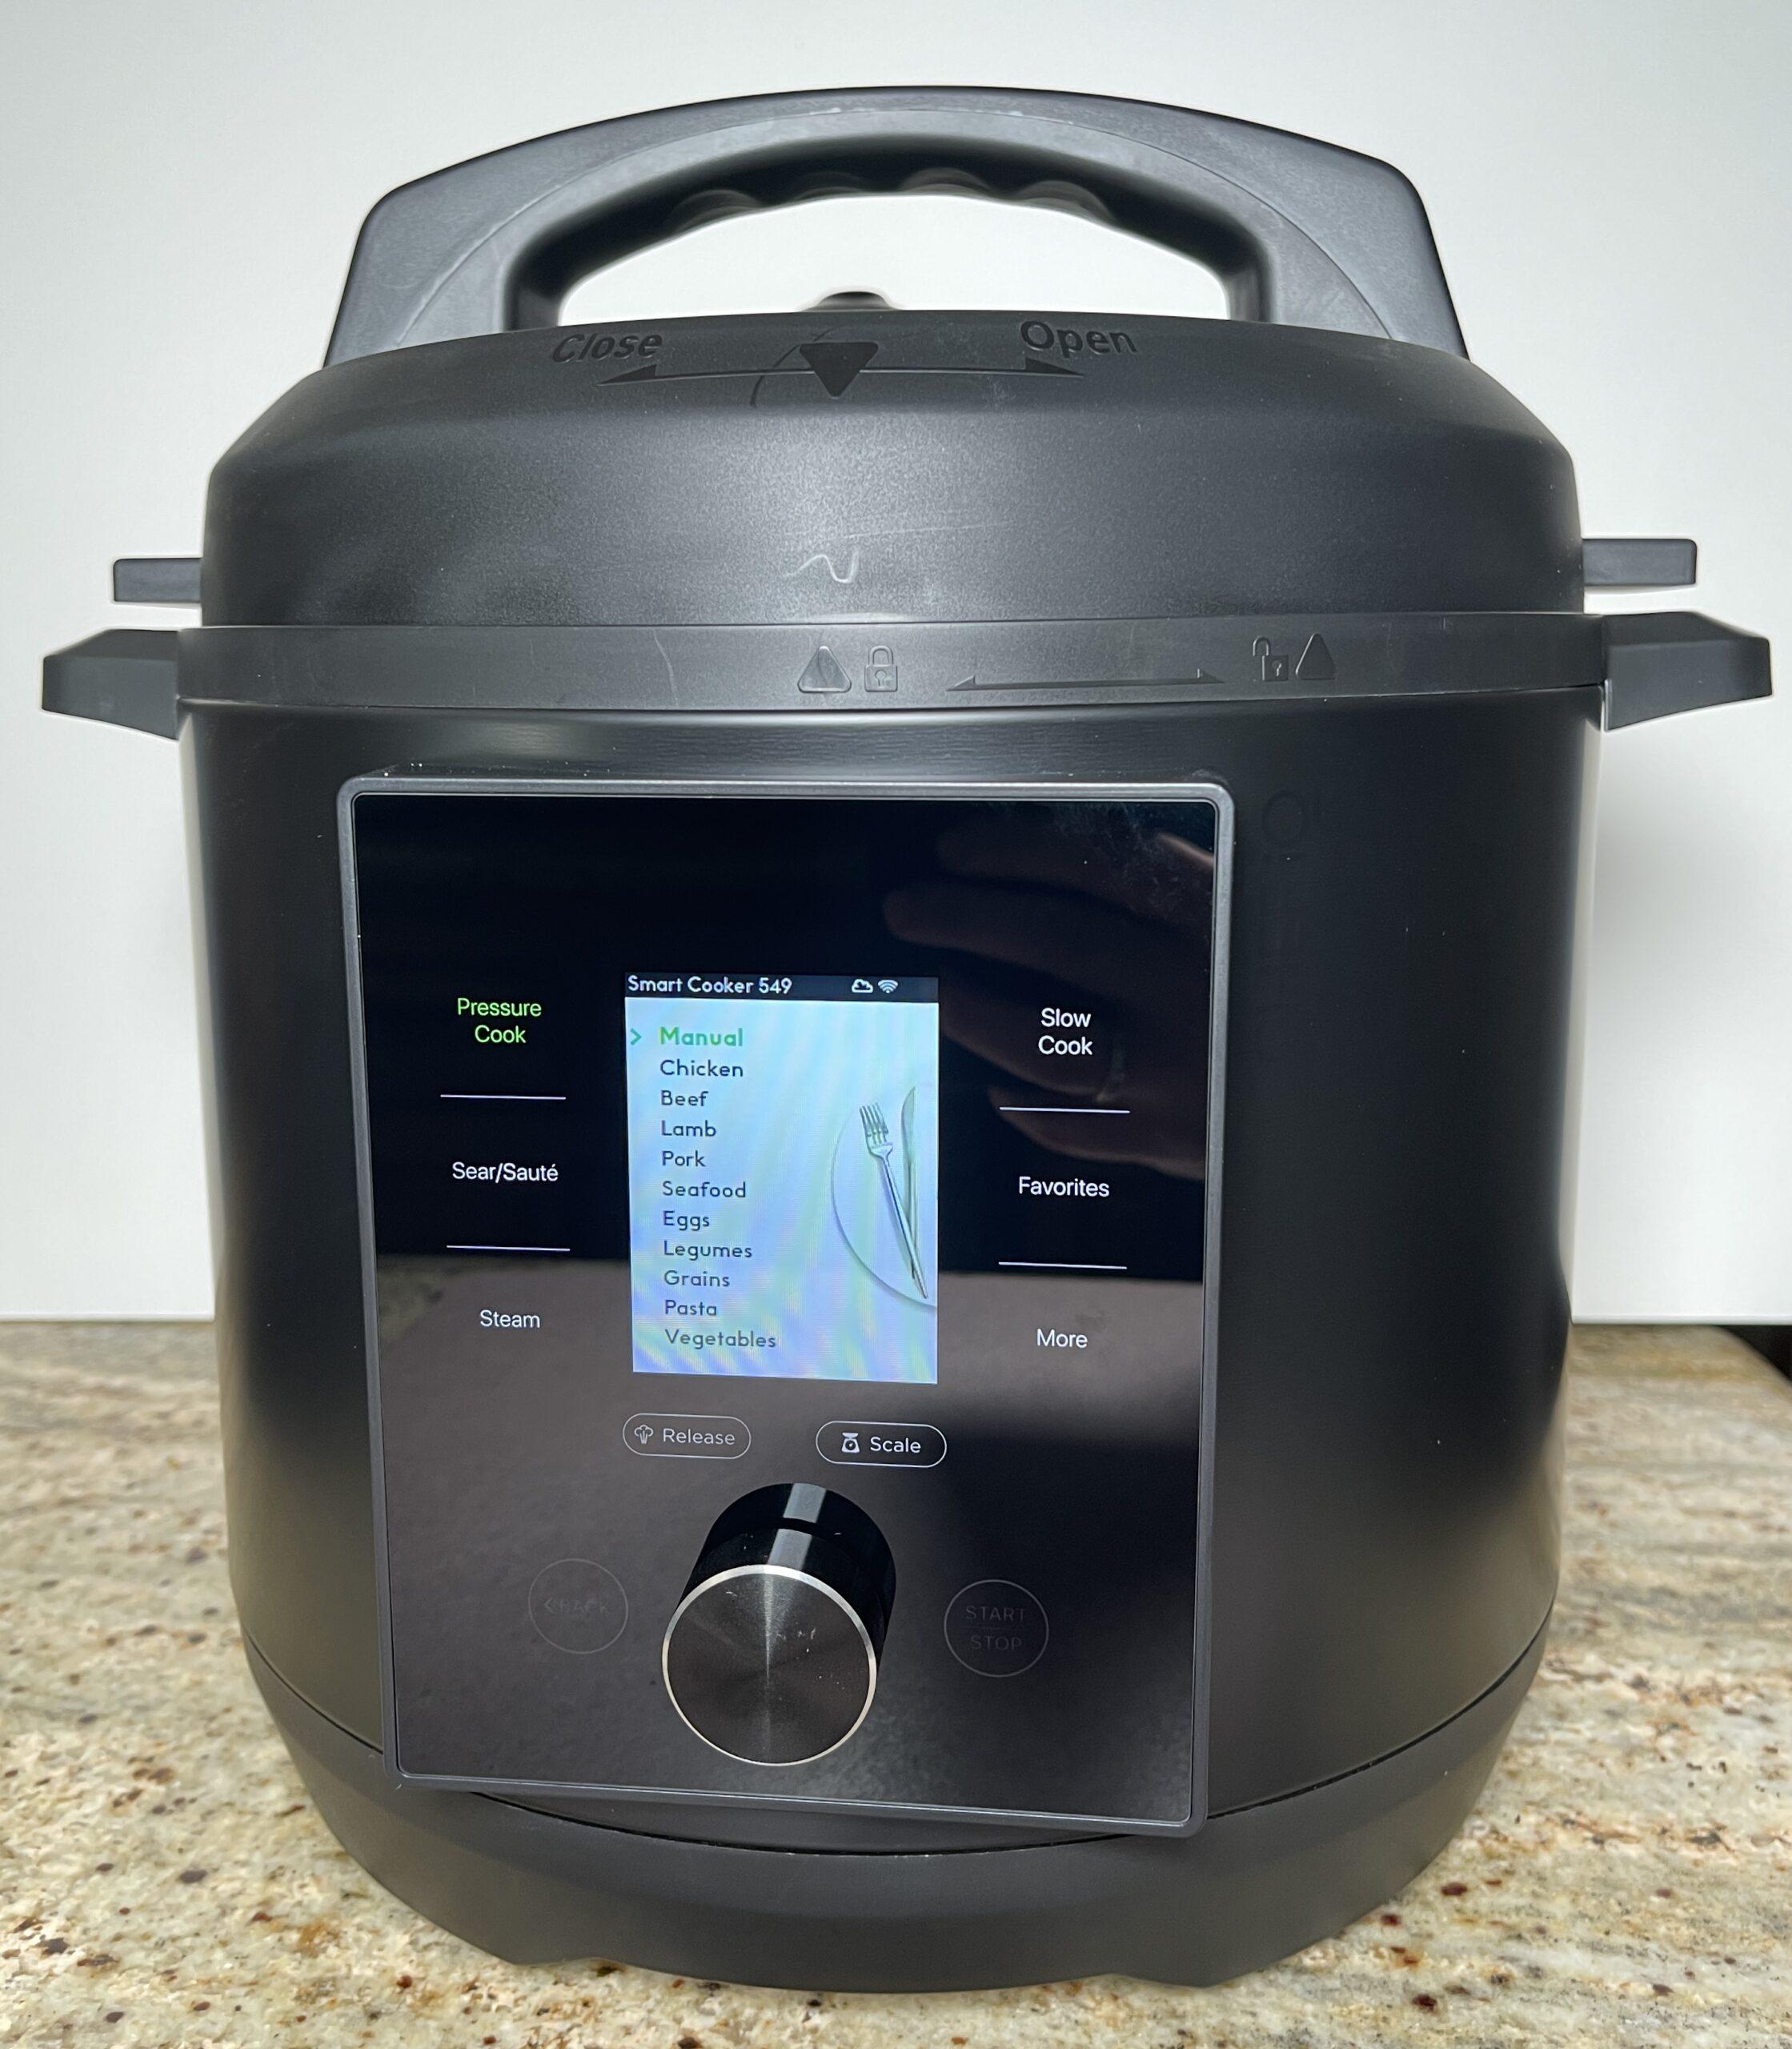 chefiq pressure cooker